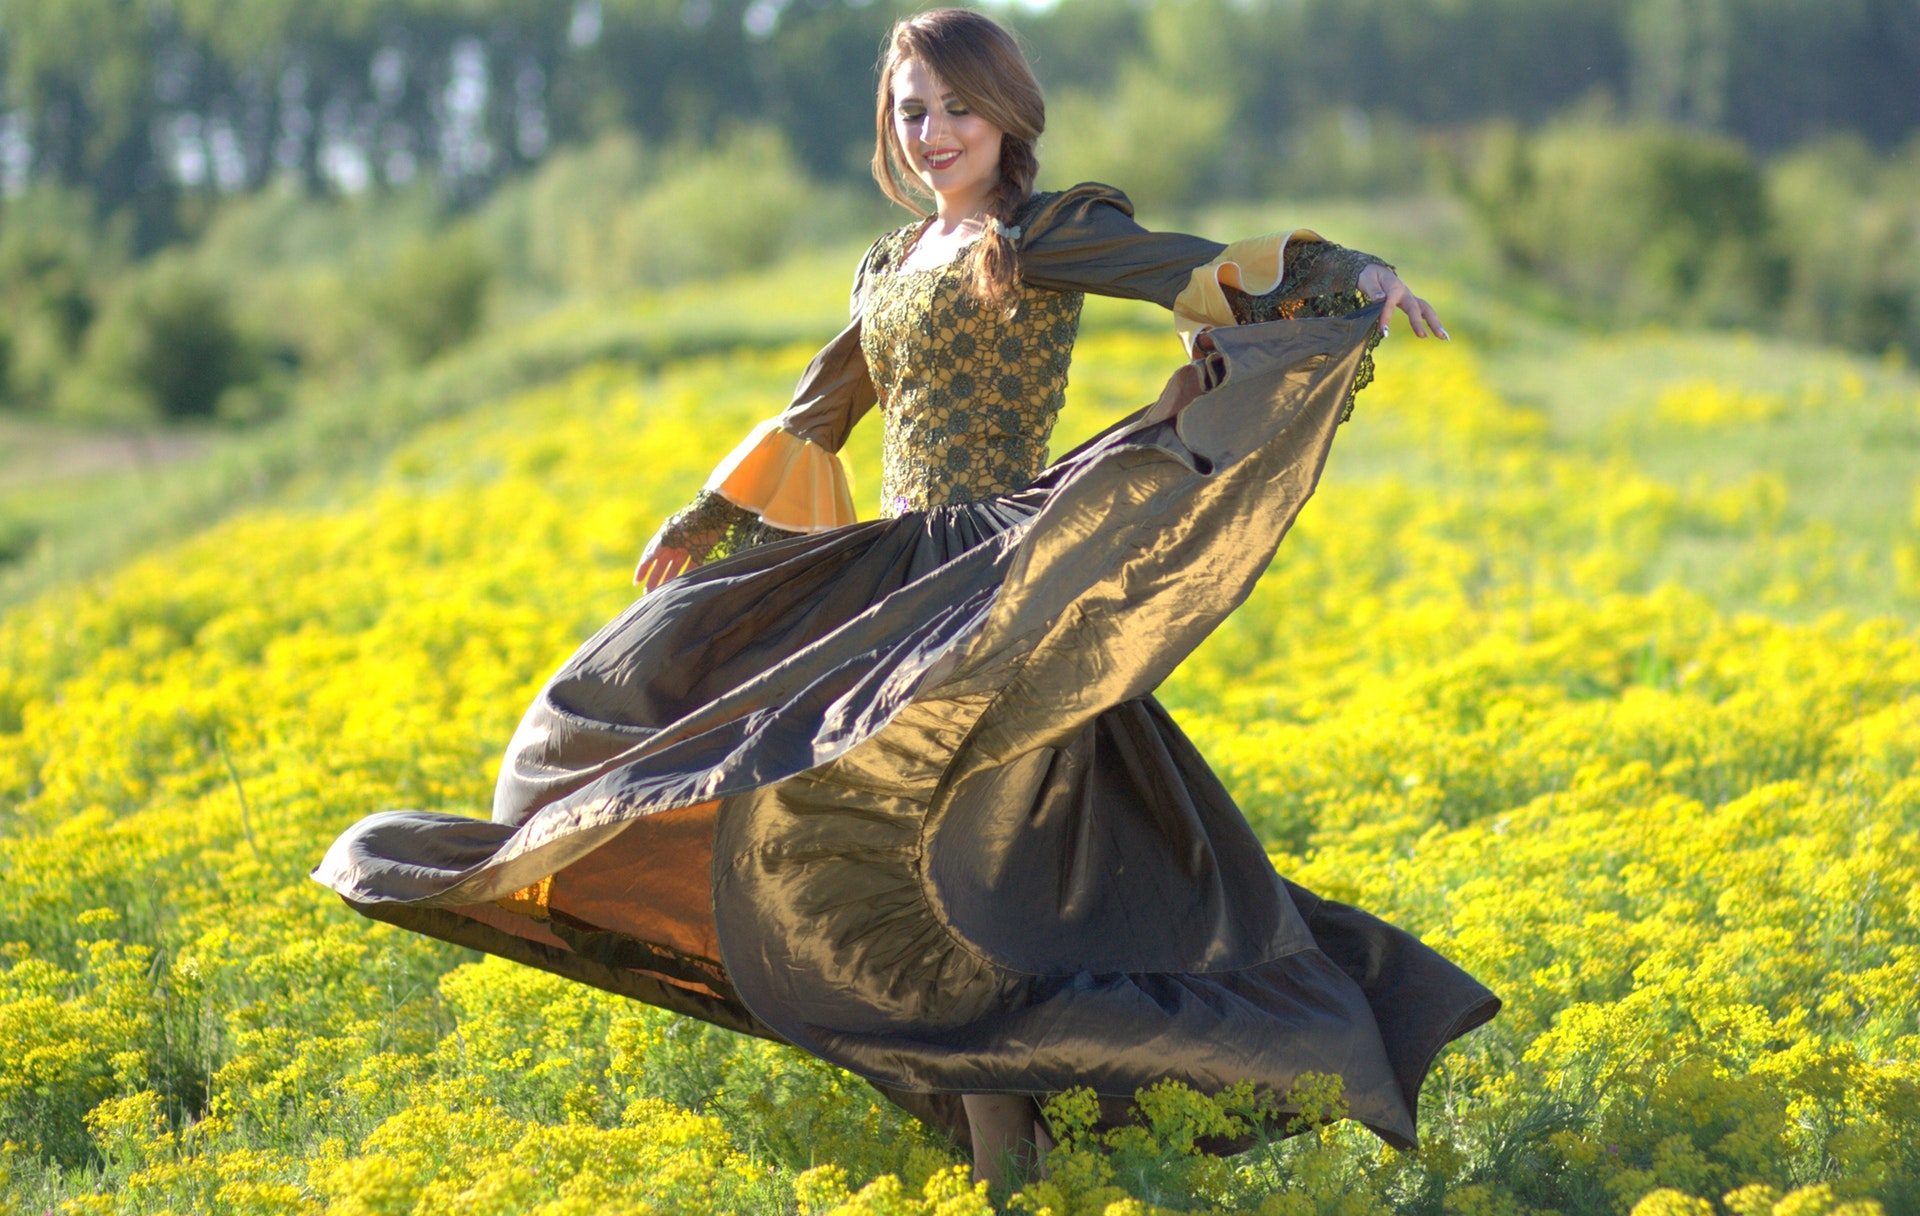 girl-dance-dress-flowers-163360.jpeg